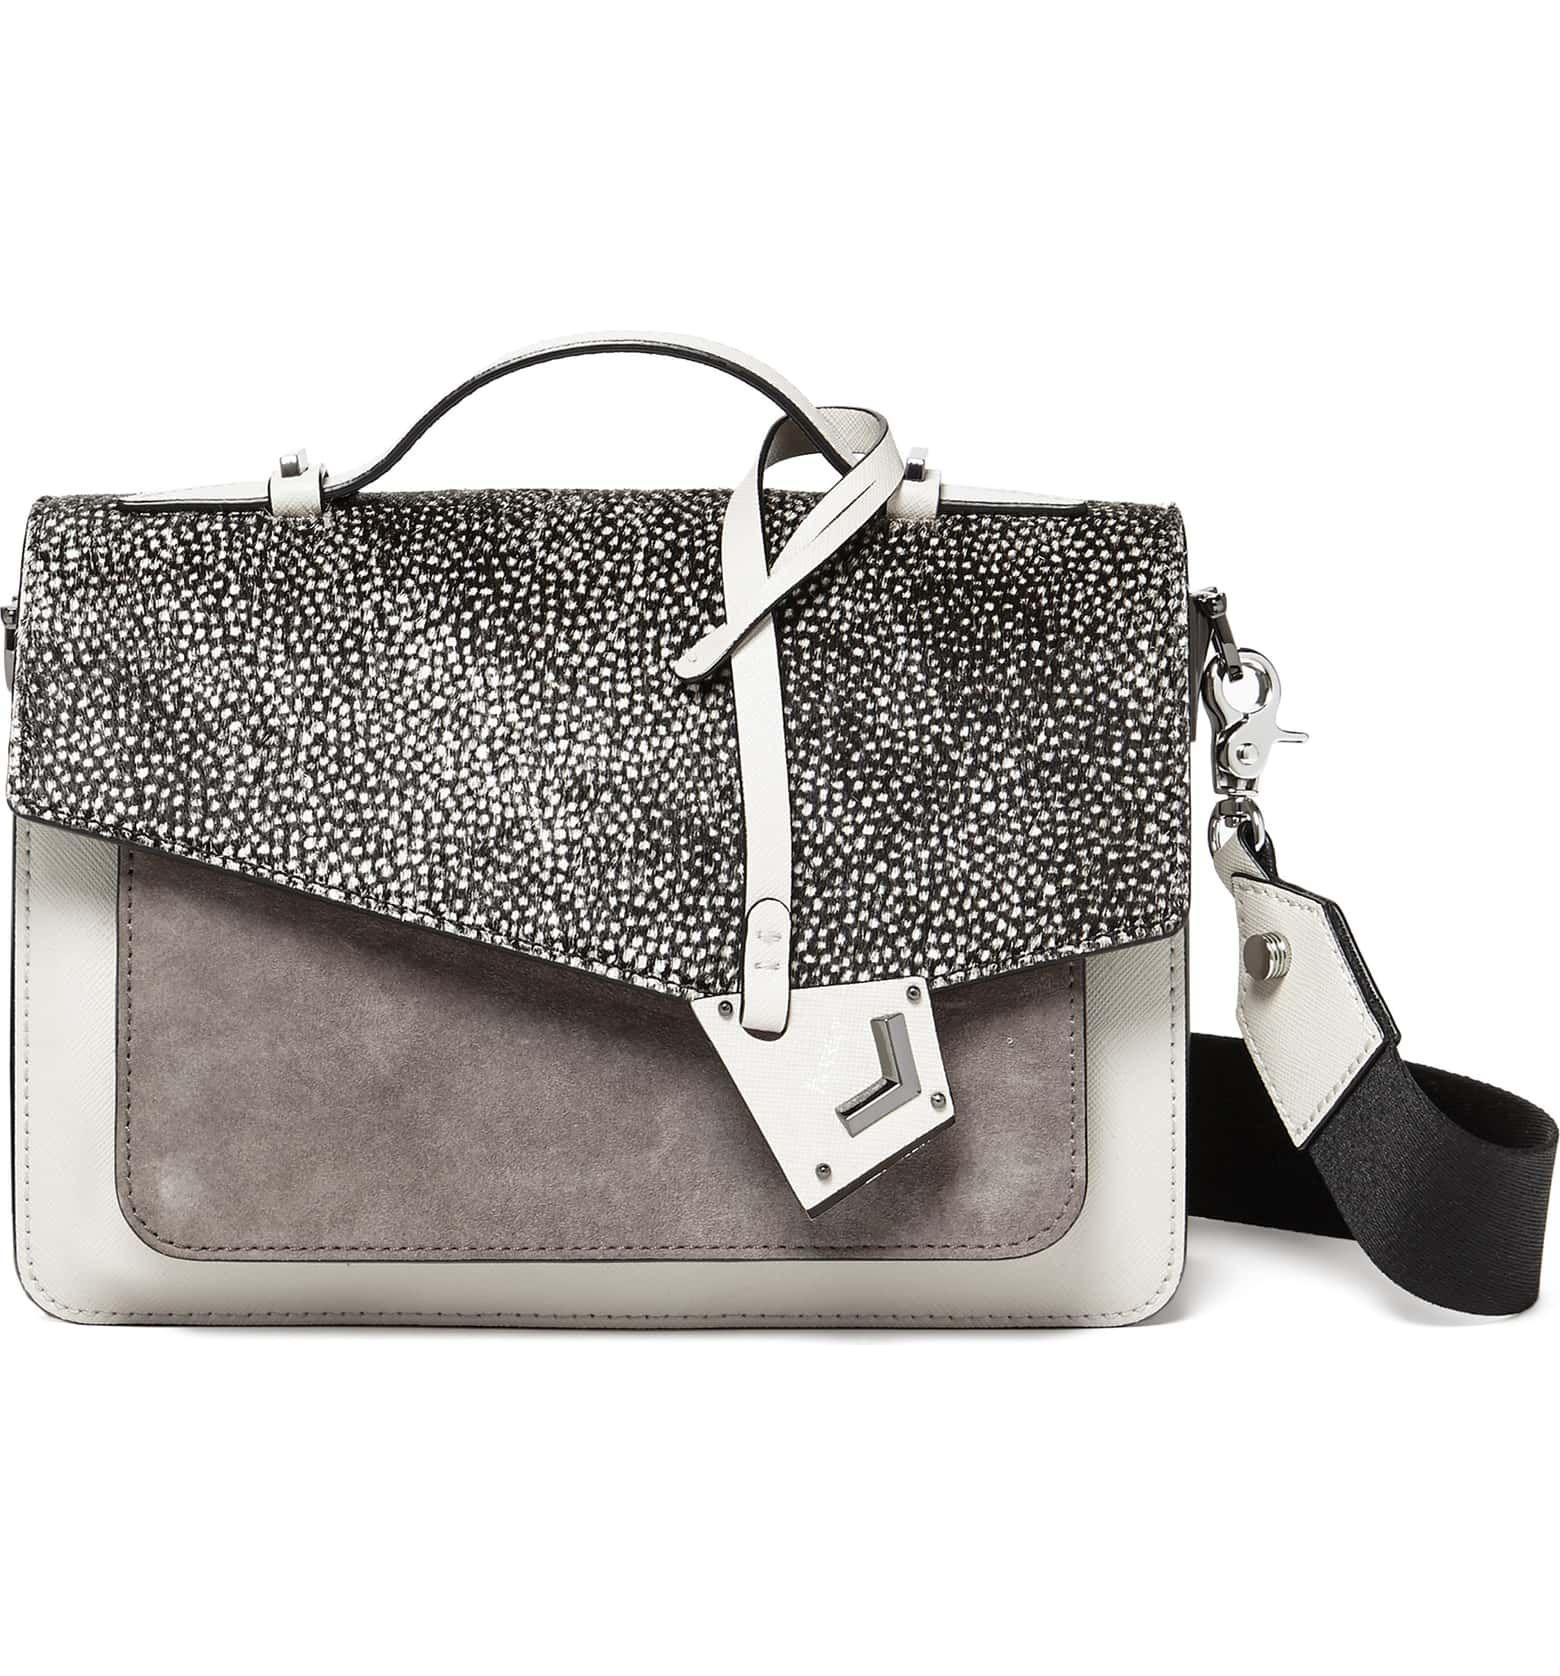 3f3178f507 Cobble Hill Calfskin Leather Crossbody Bag